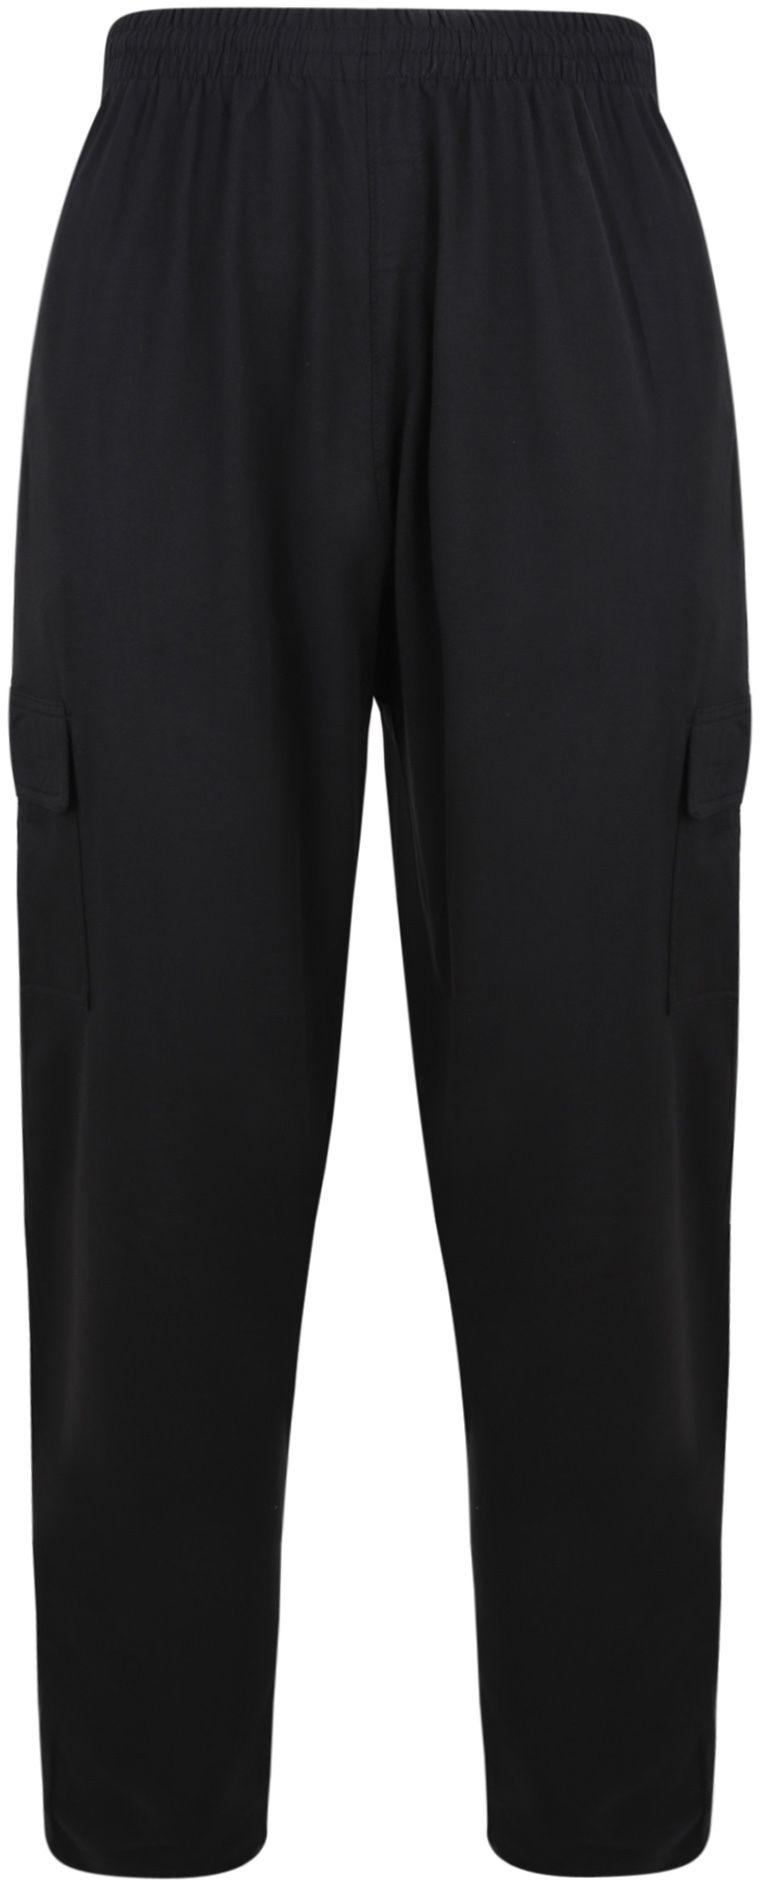 Pantalon de Jogging Noir Grande Taille KAM JEANSWEAR Taille Haute